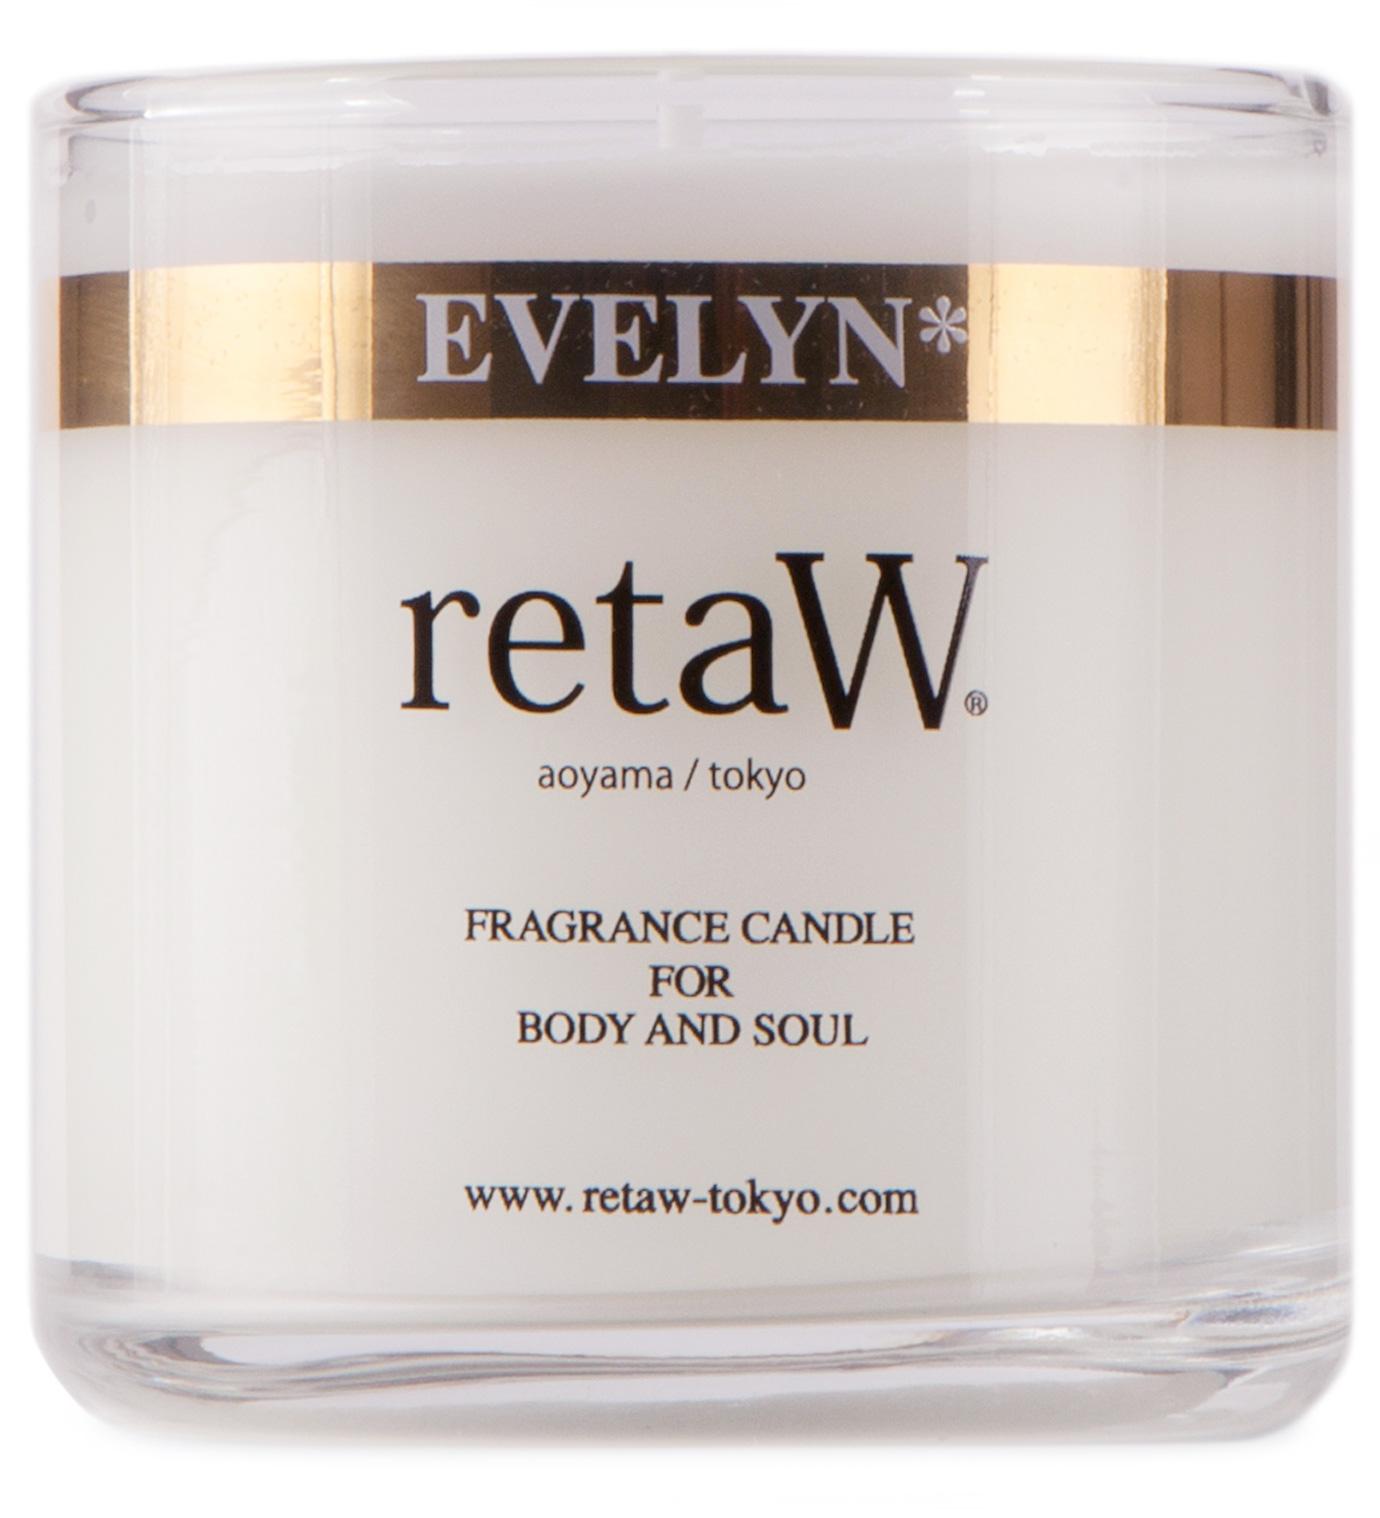 retaW Evelyn Candle